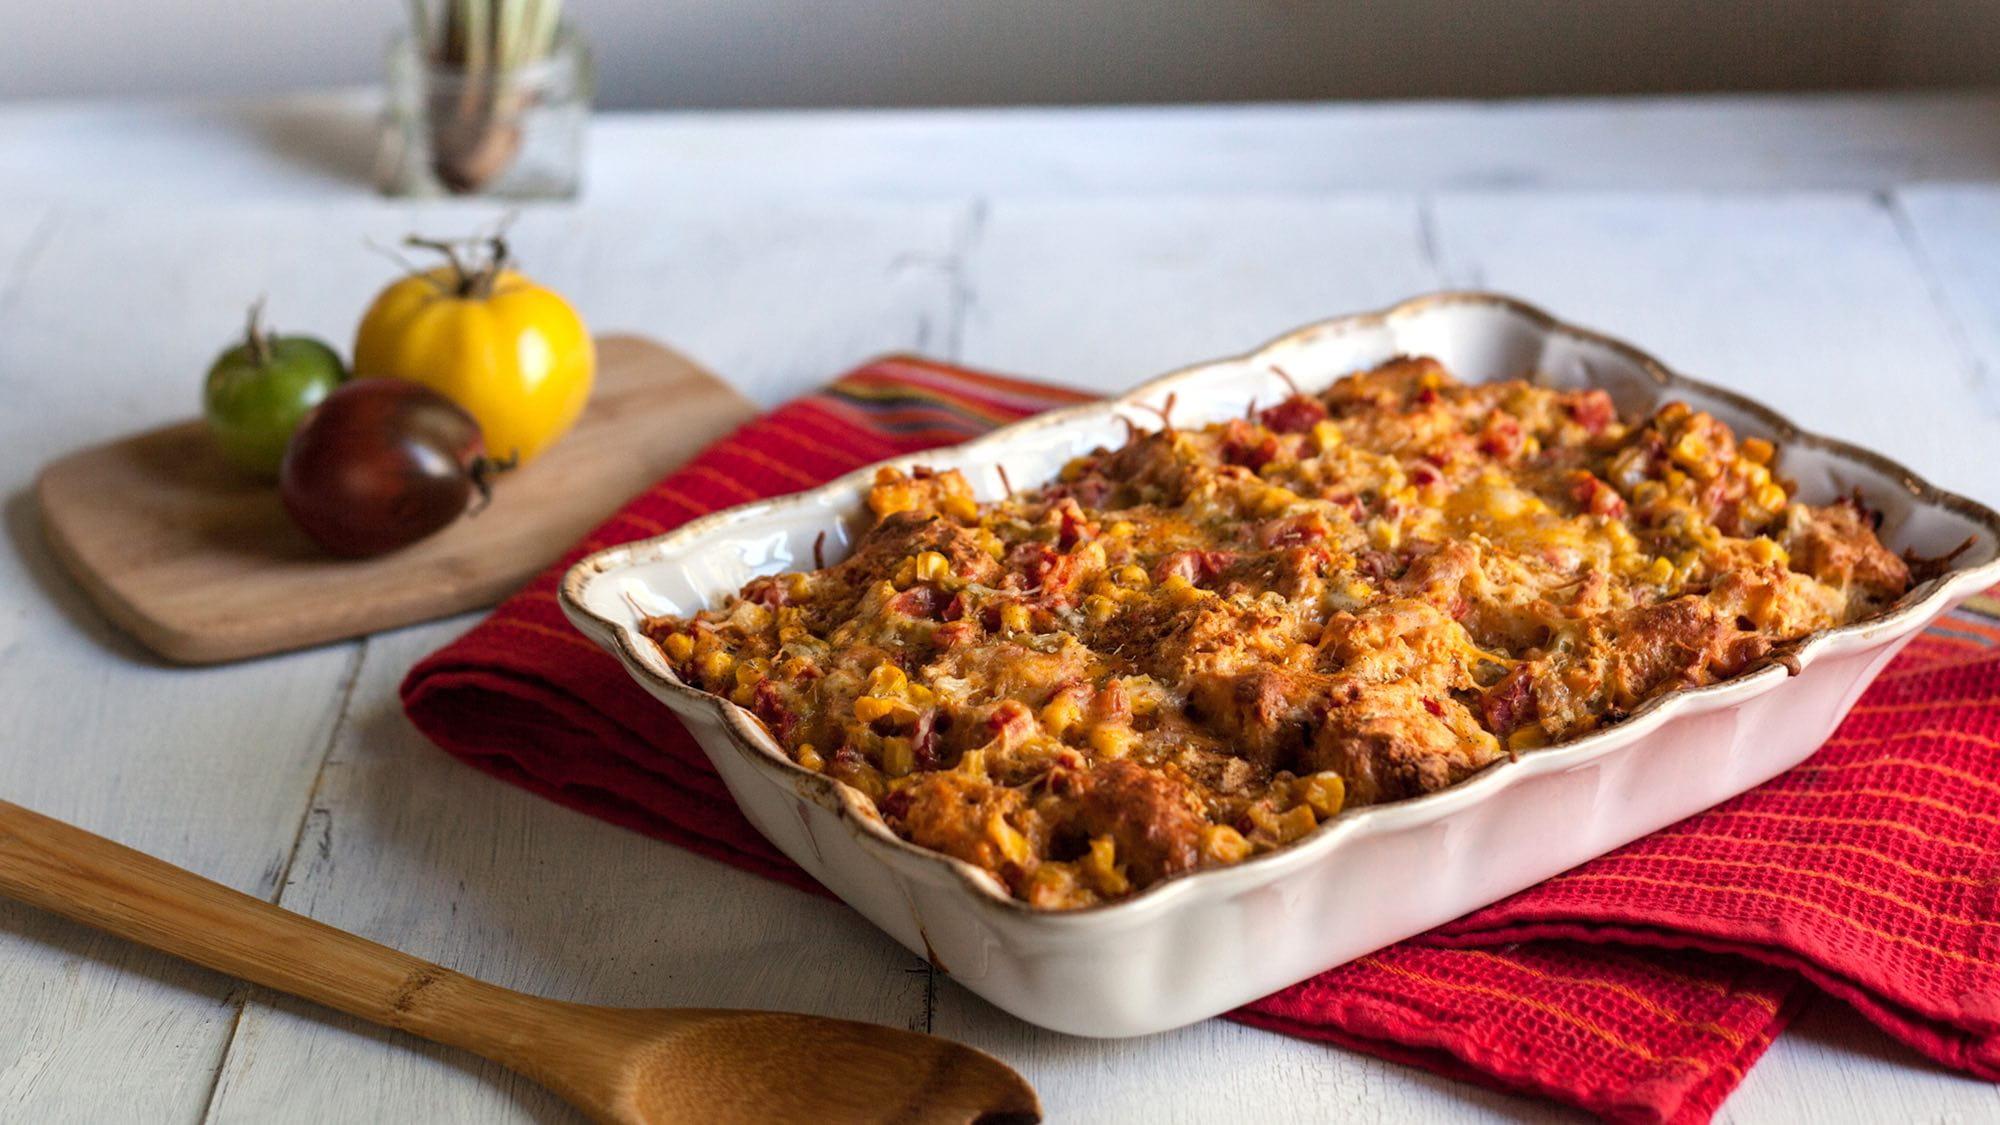 cheesy-mexican-cornbread-casserole-adventures-in-cooking.jpg